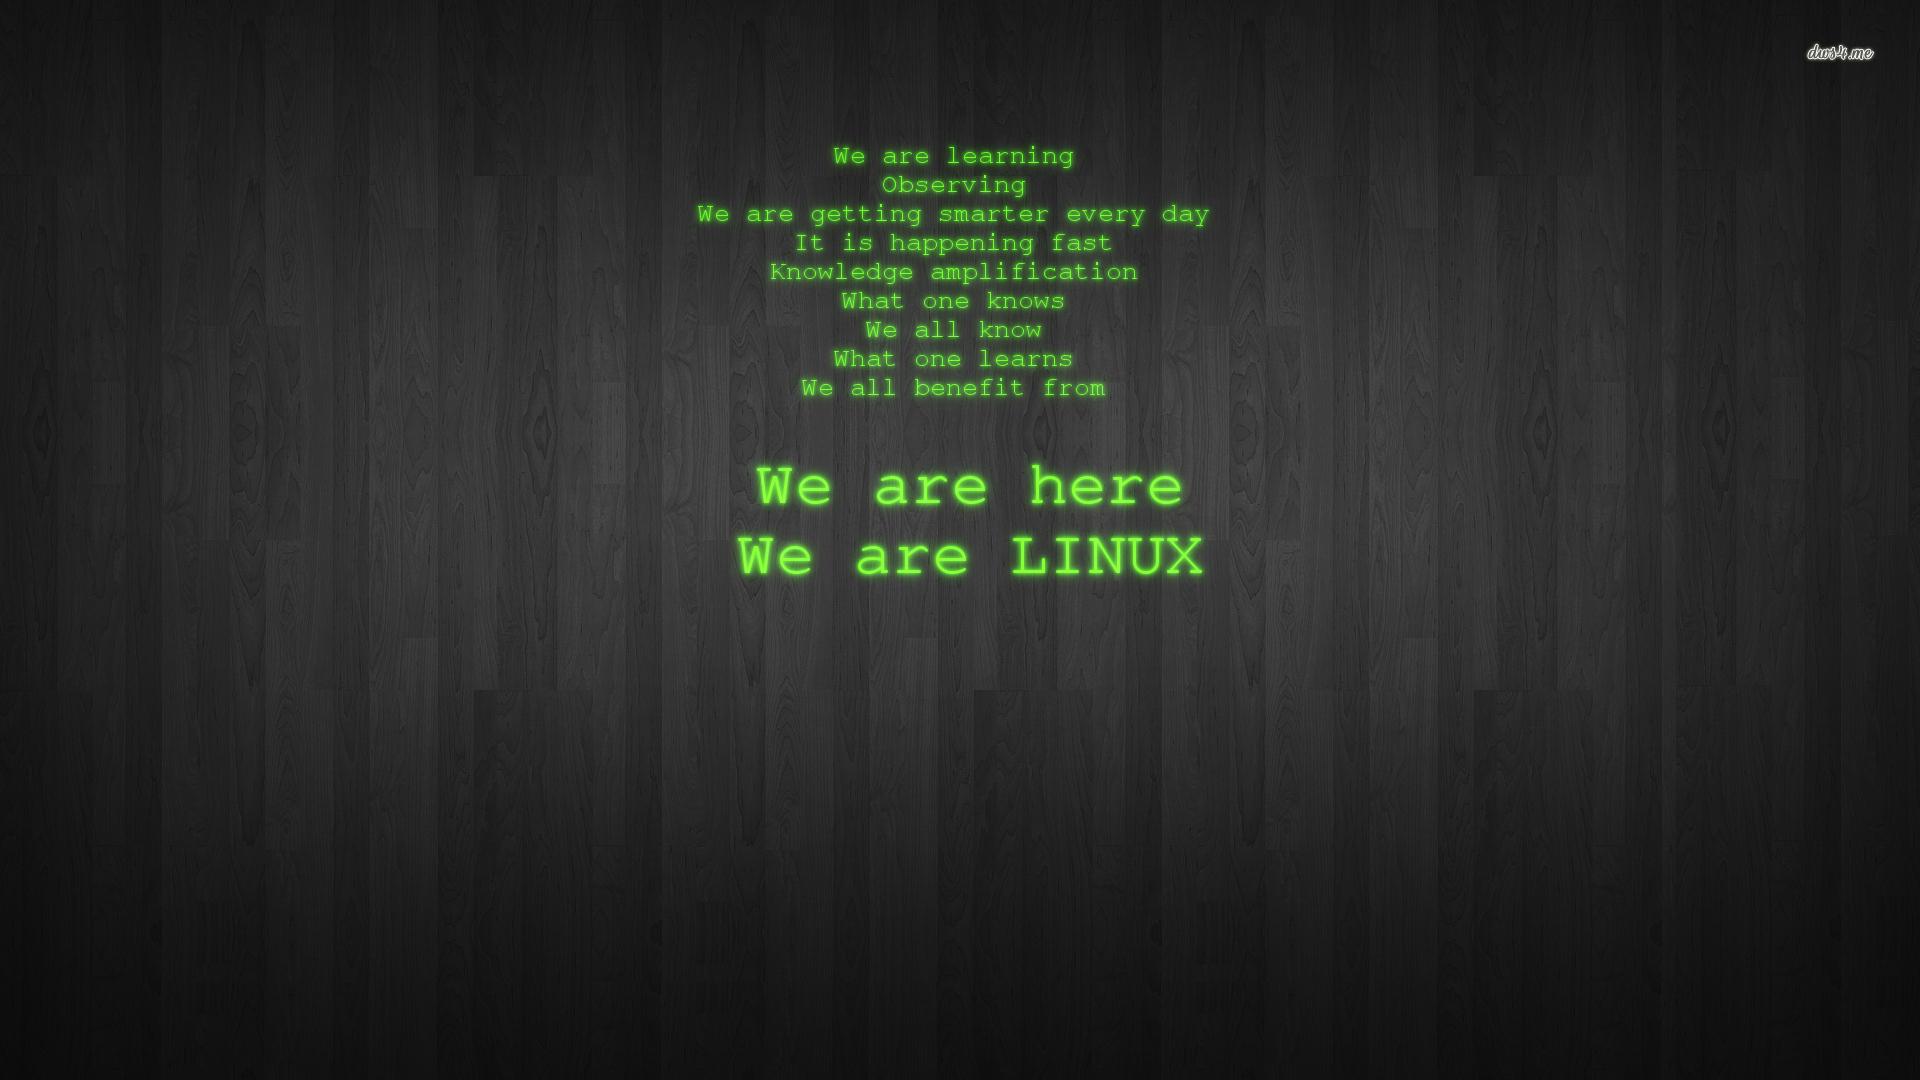 Best Linux Wallpaper 1920x1080